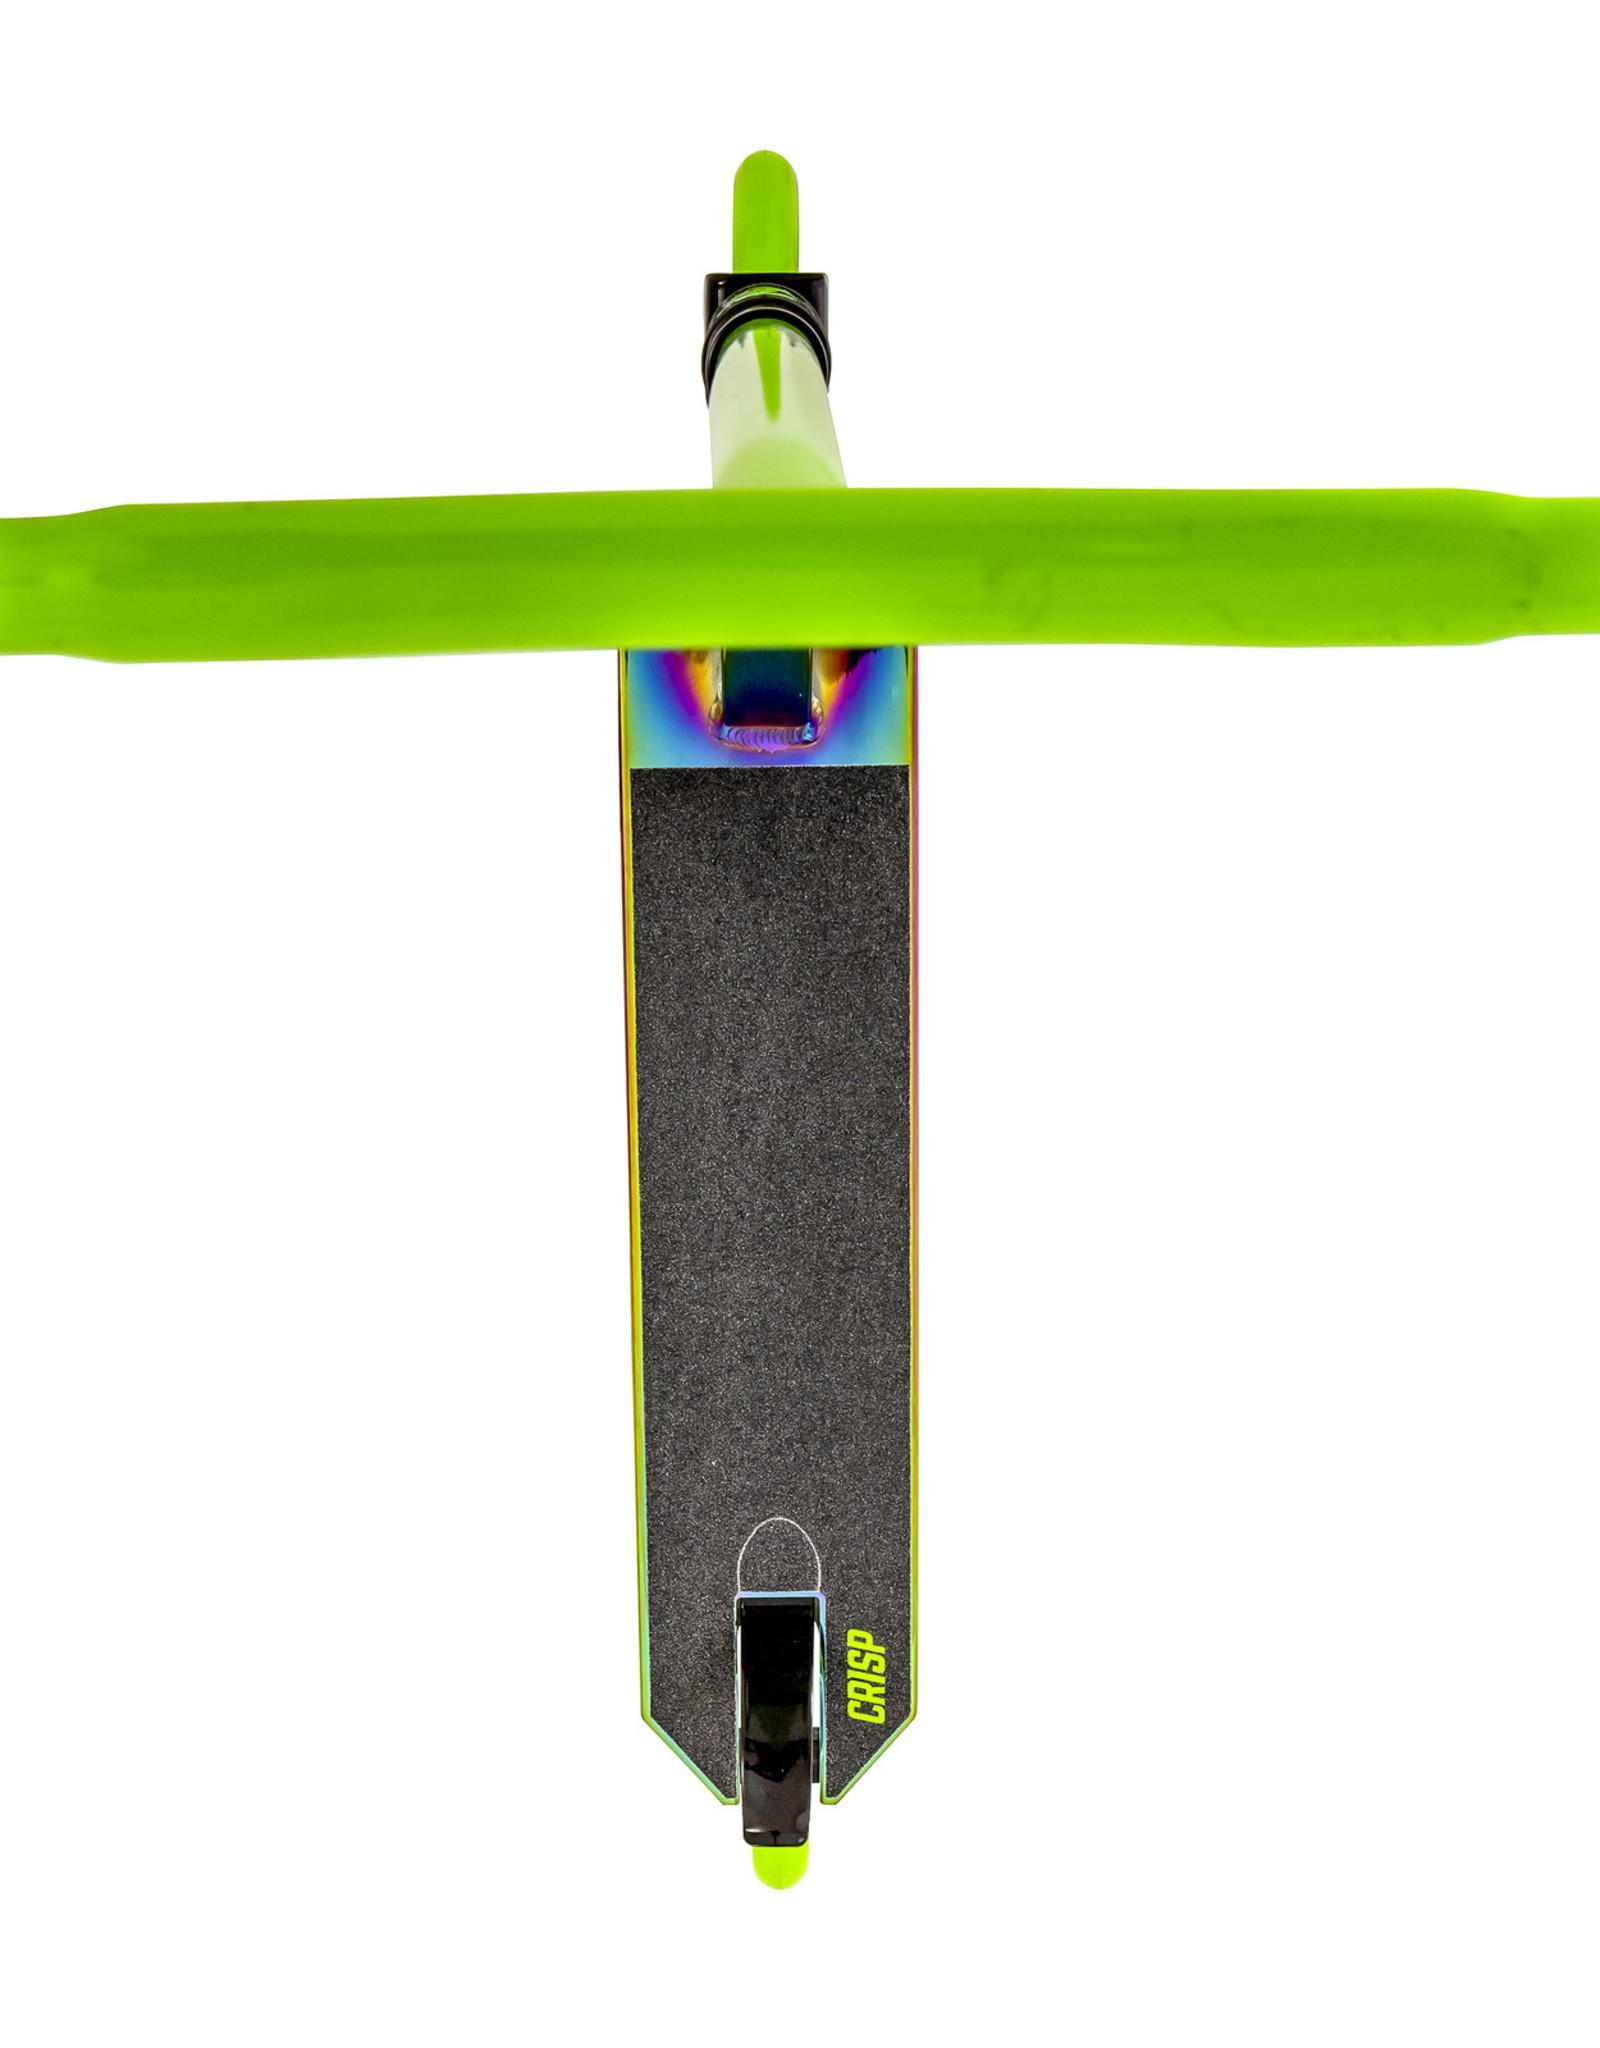 CRISP Crisp Surge Scooter Oil Slick Green